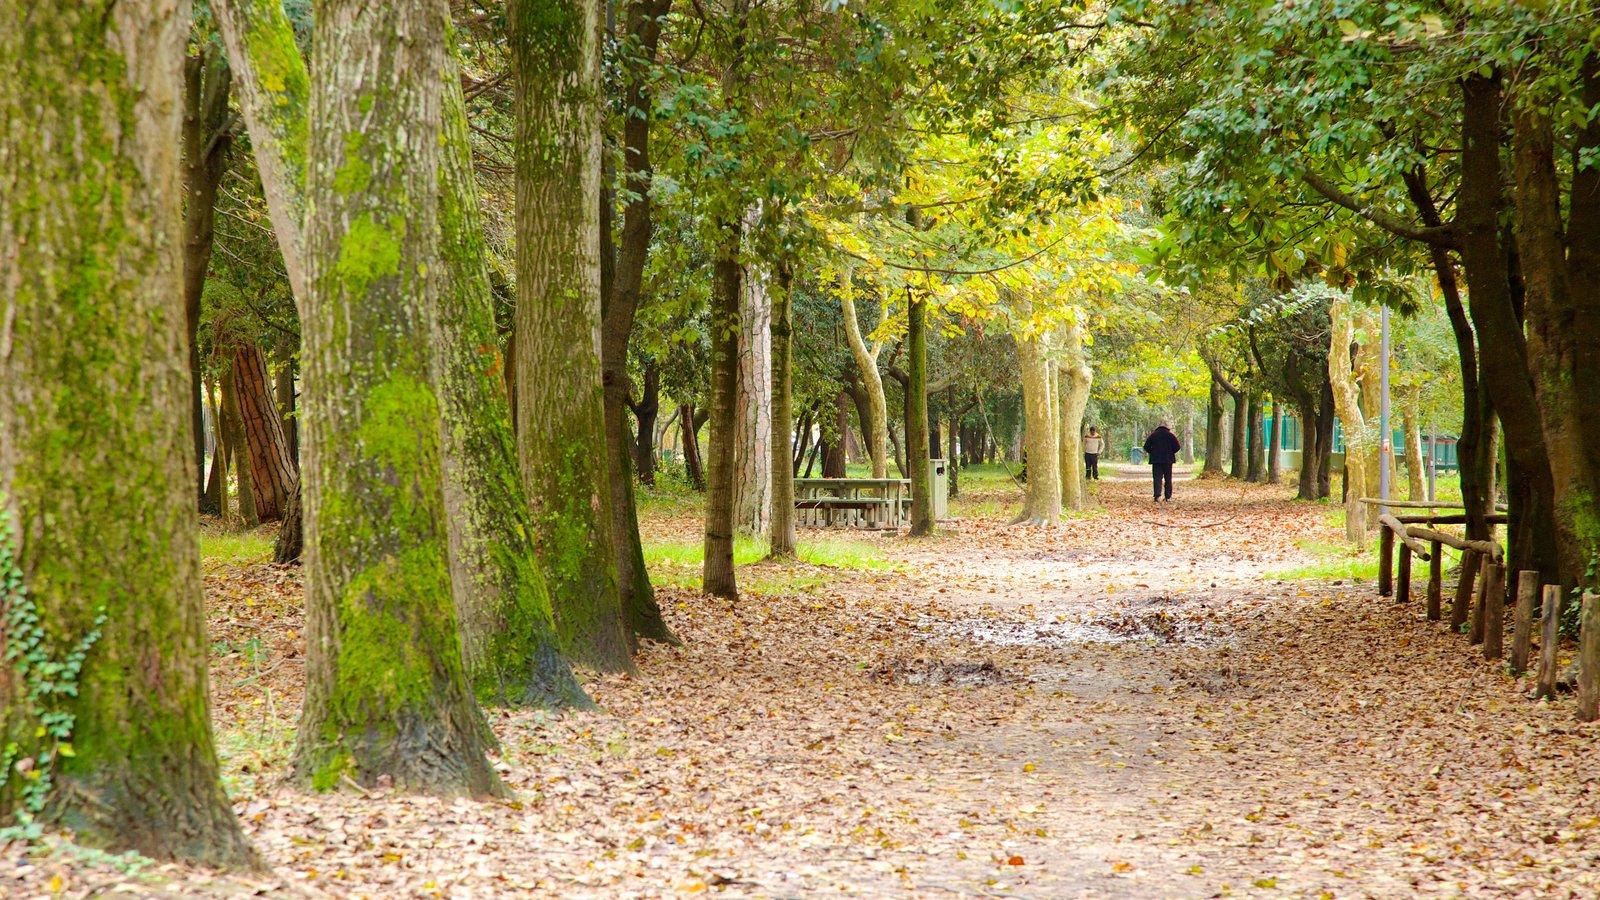 Pineta di Ponente featuring a garden and forest scenes